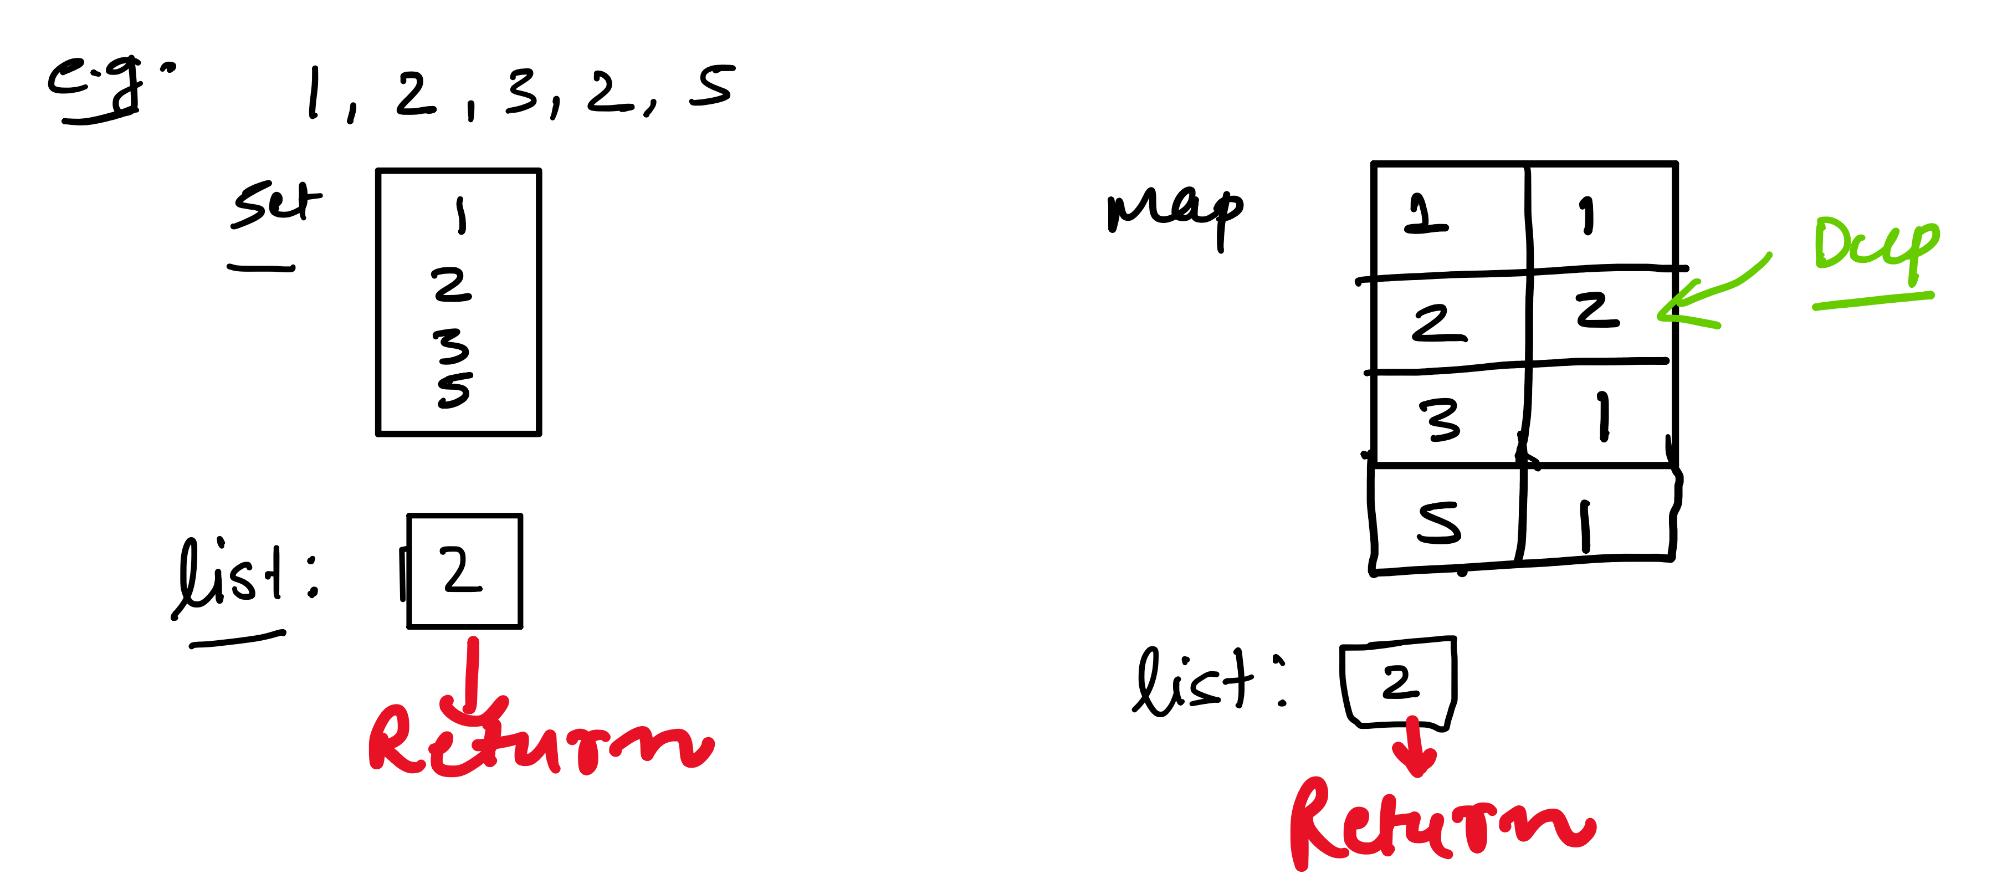 Set & Map